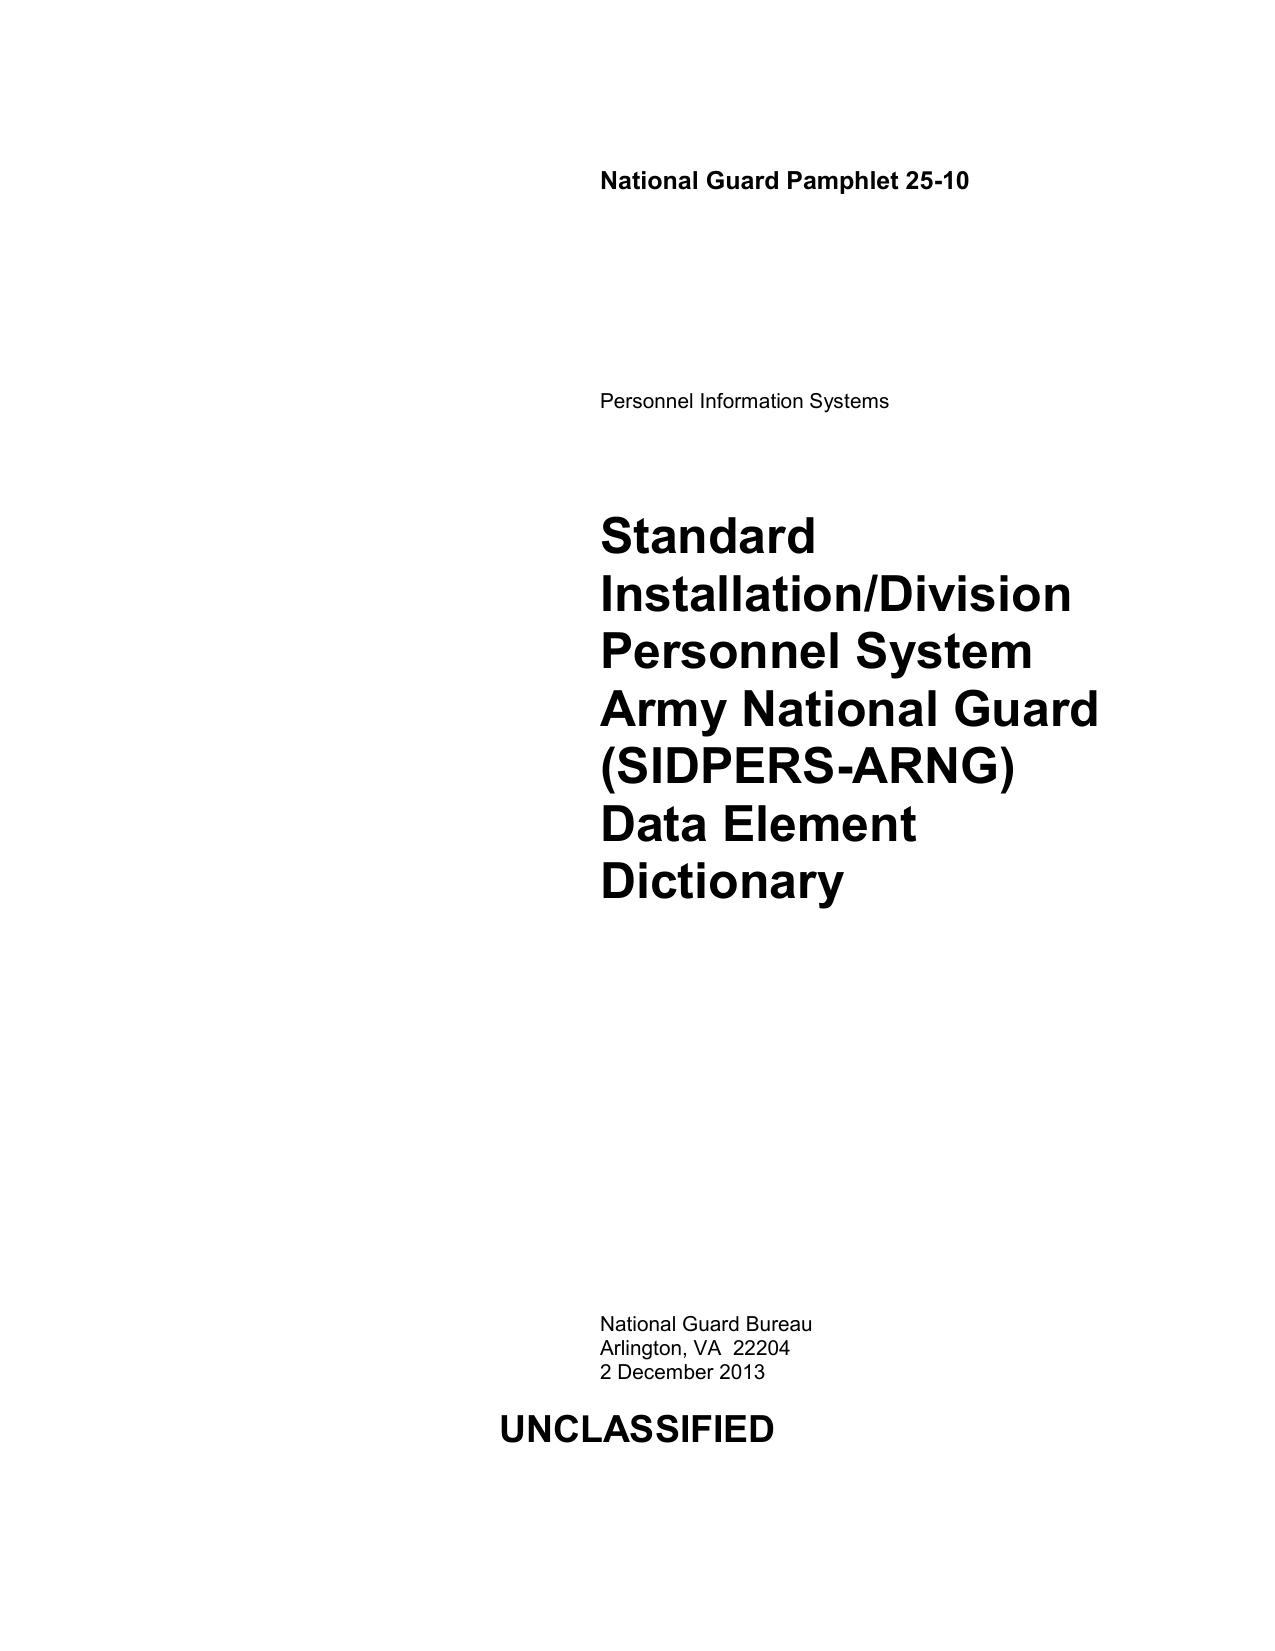 prada shoes 40-501 army regulation 40-501 page